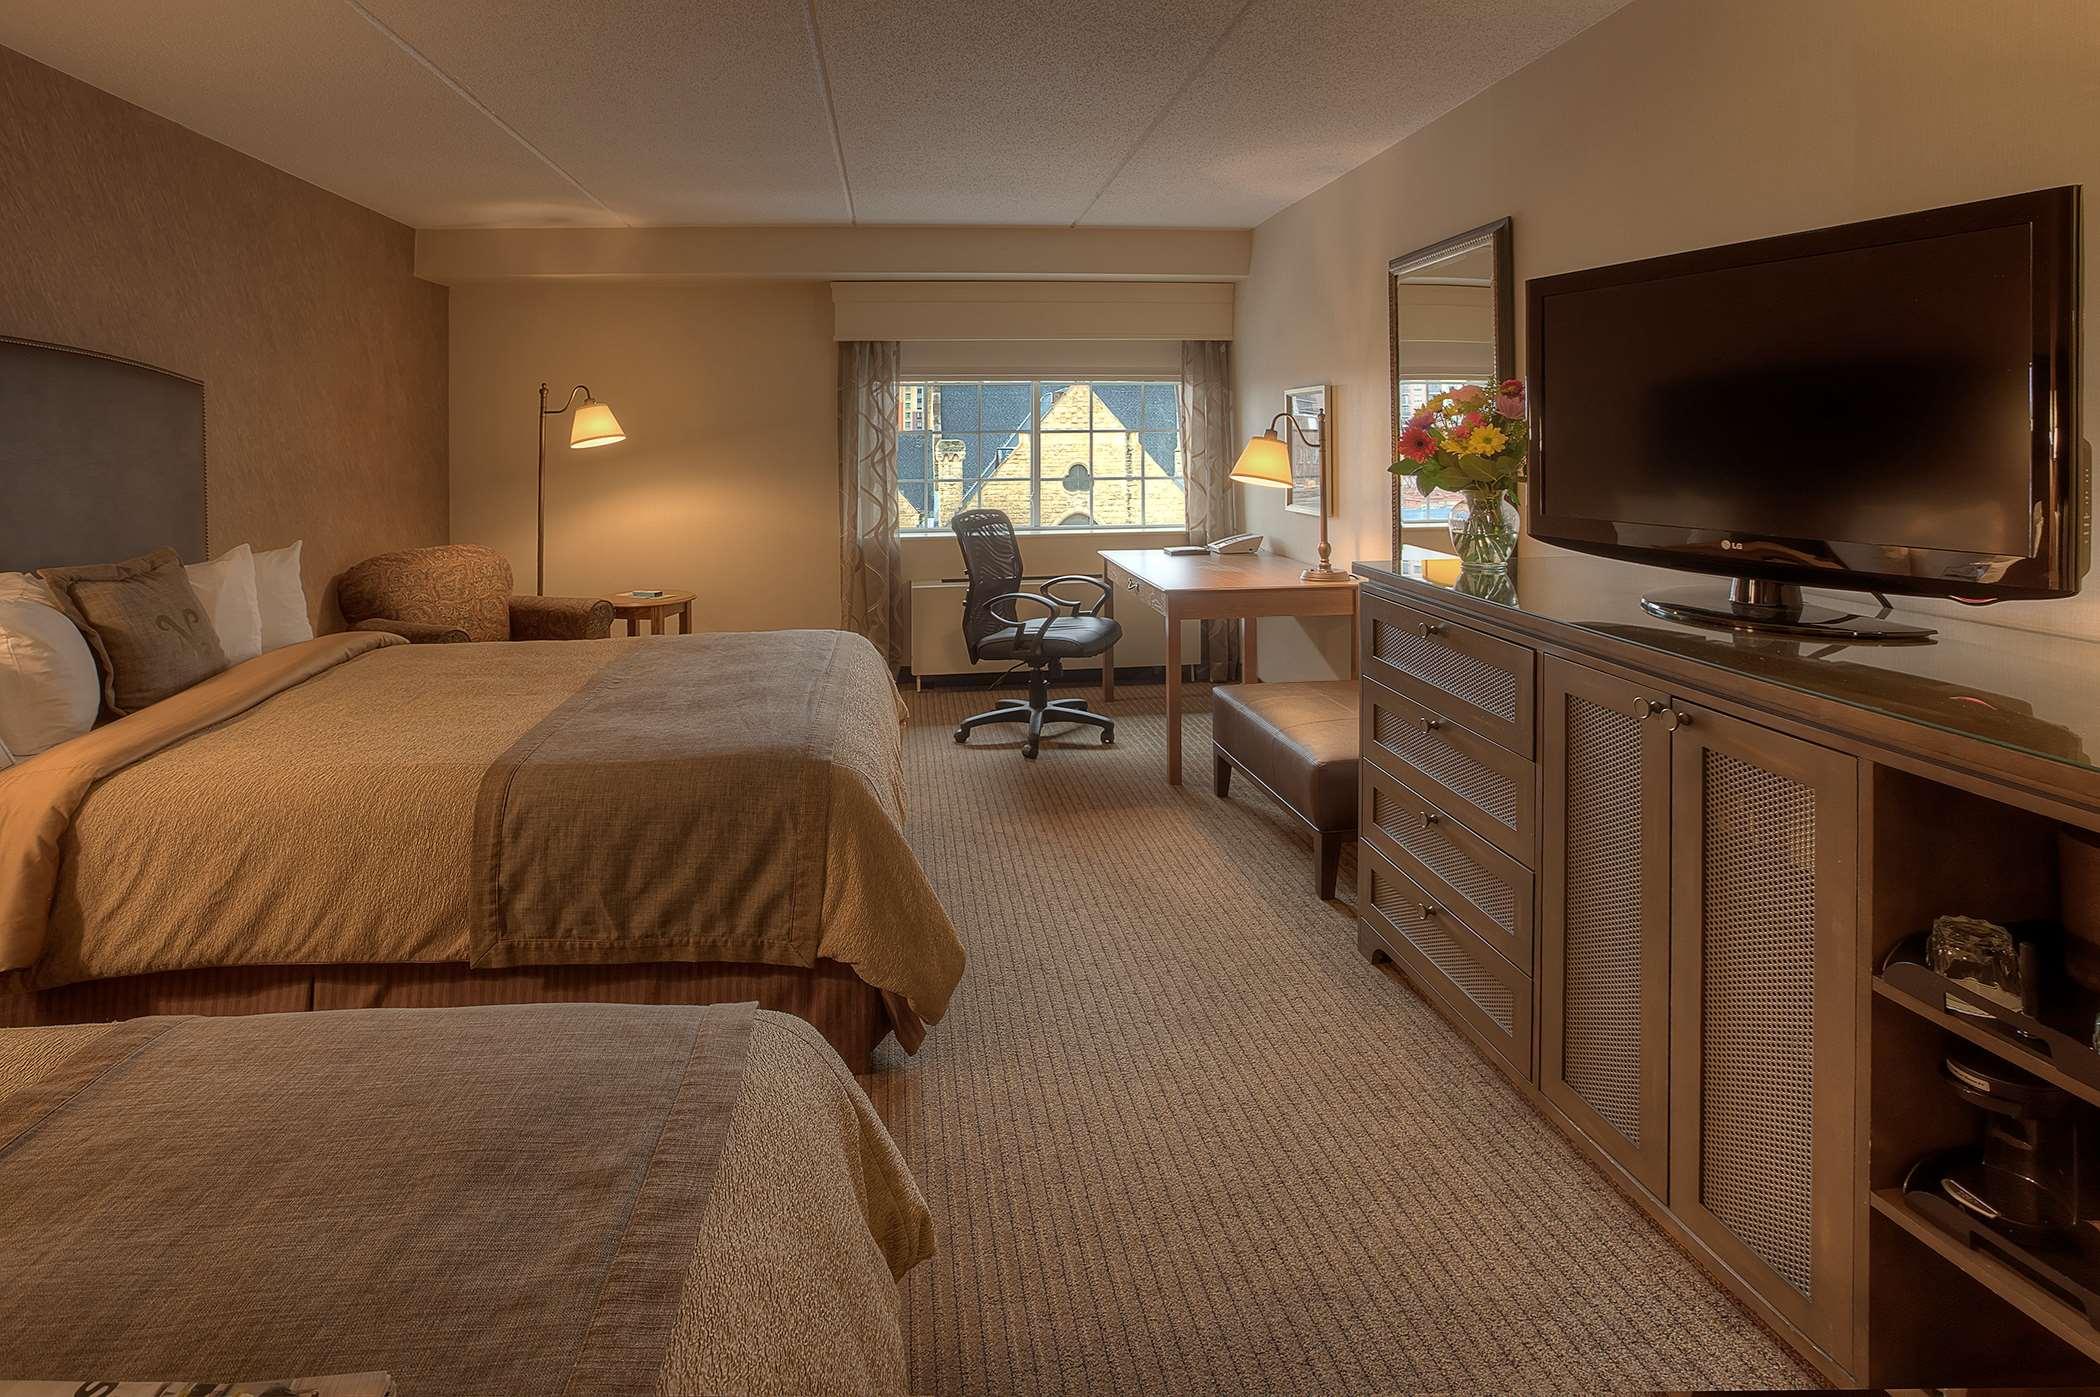 Best Western Plus The Normandy Inn & Suites image 10